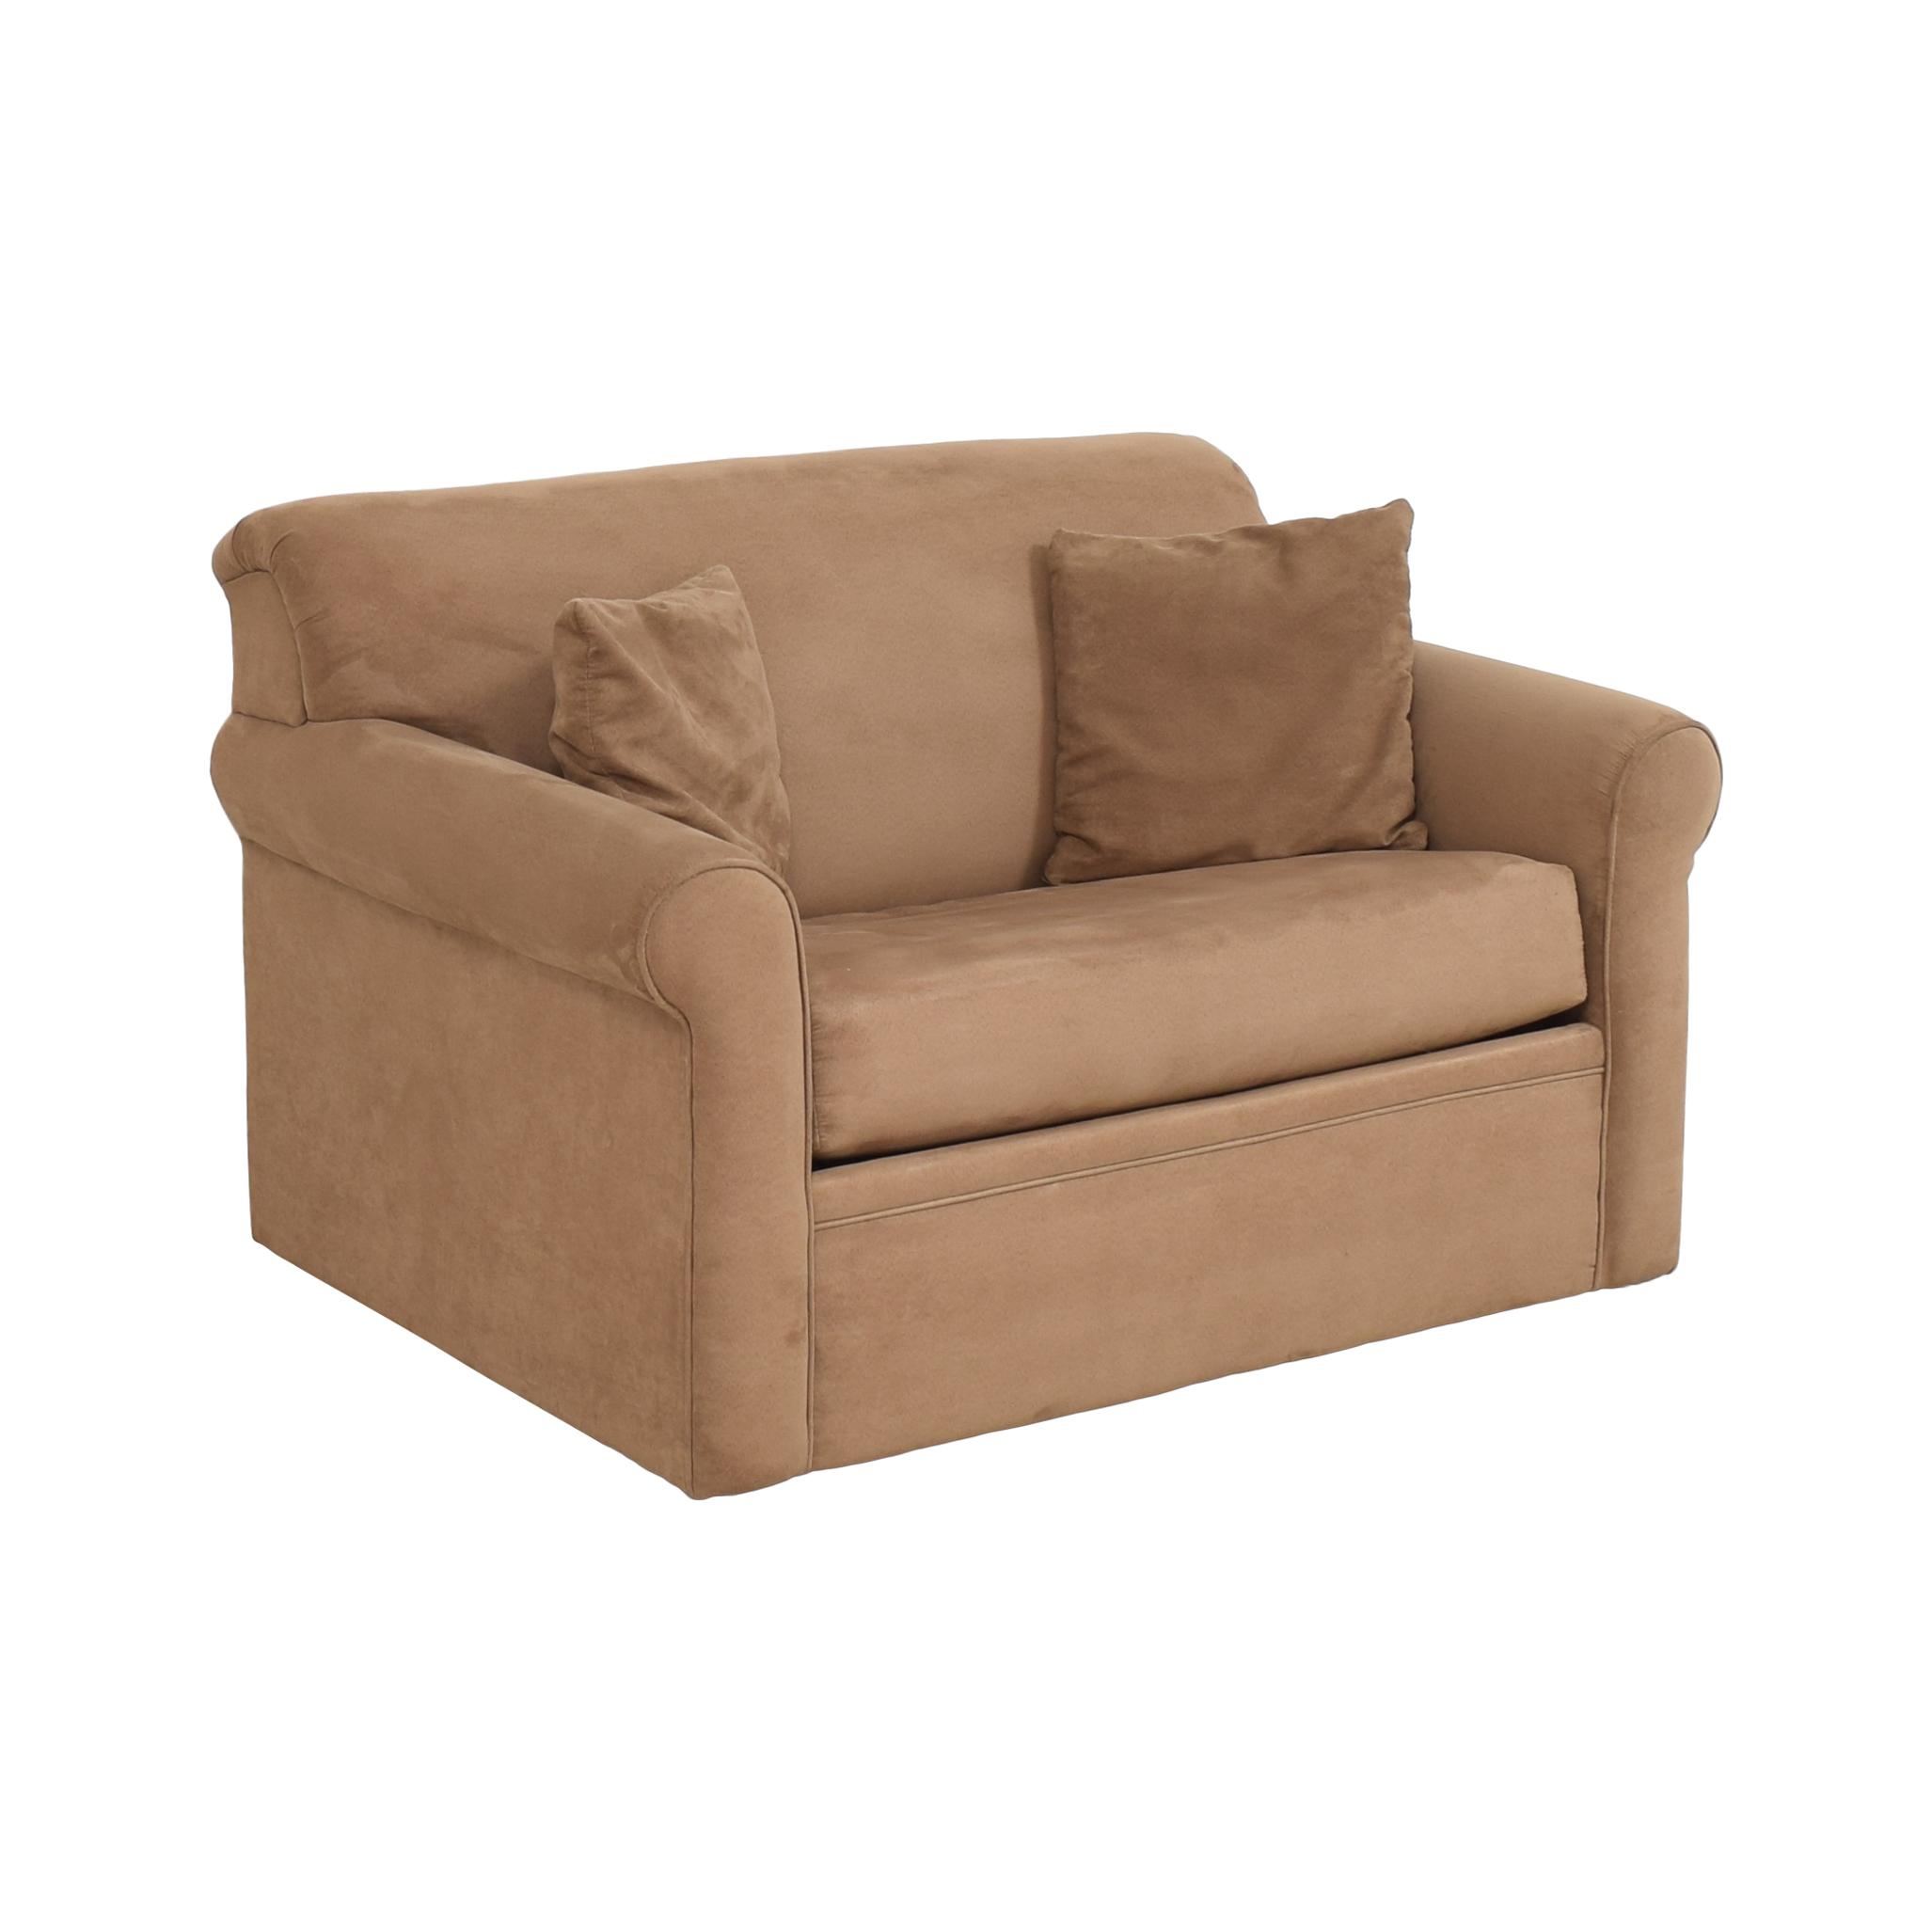 Overnight Sofa Overnight Sofa Sleeper Chair dimensions